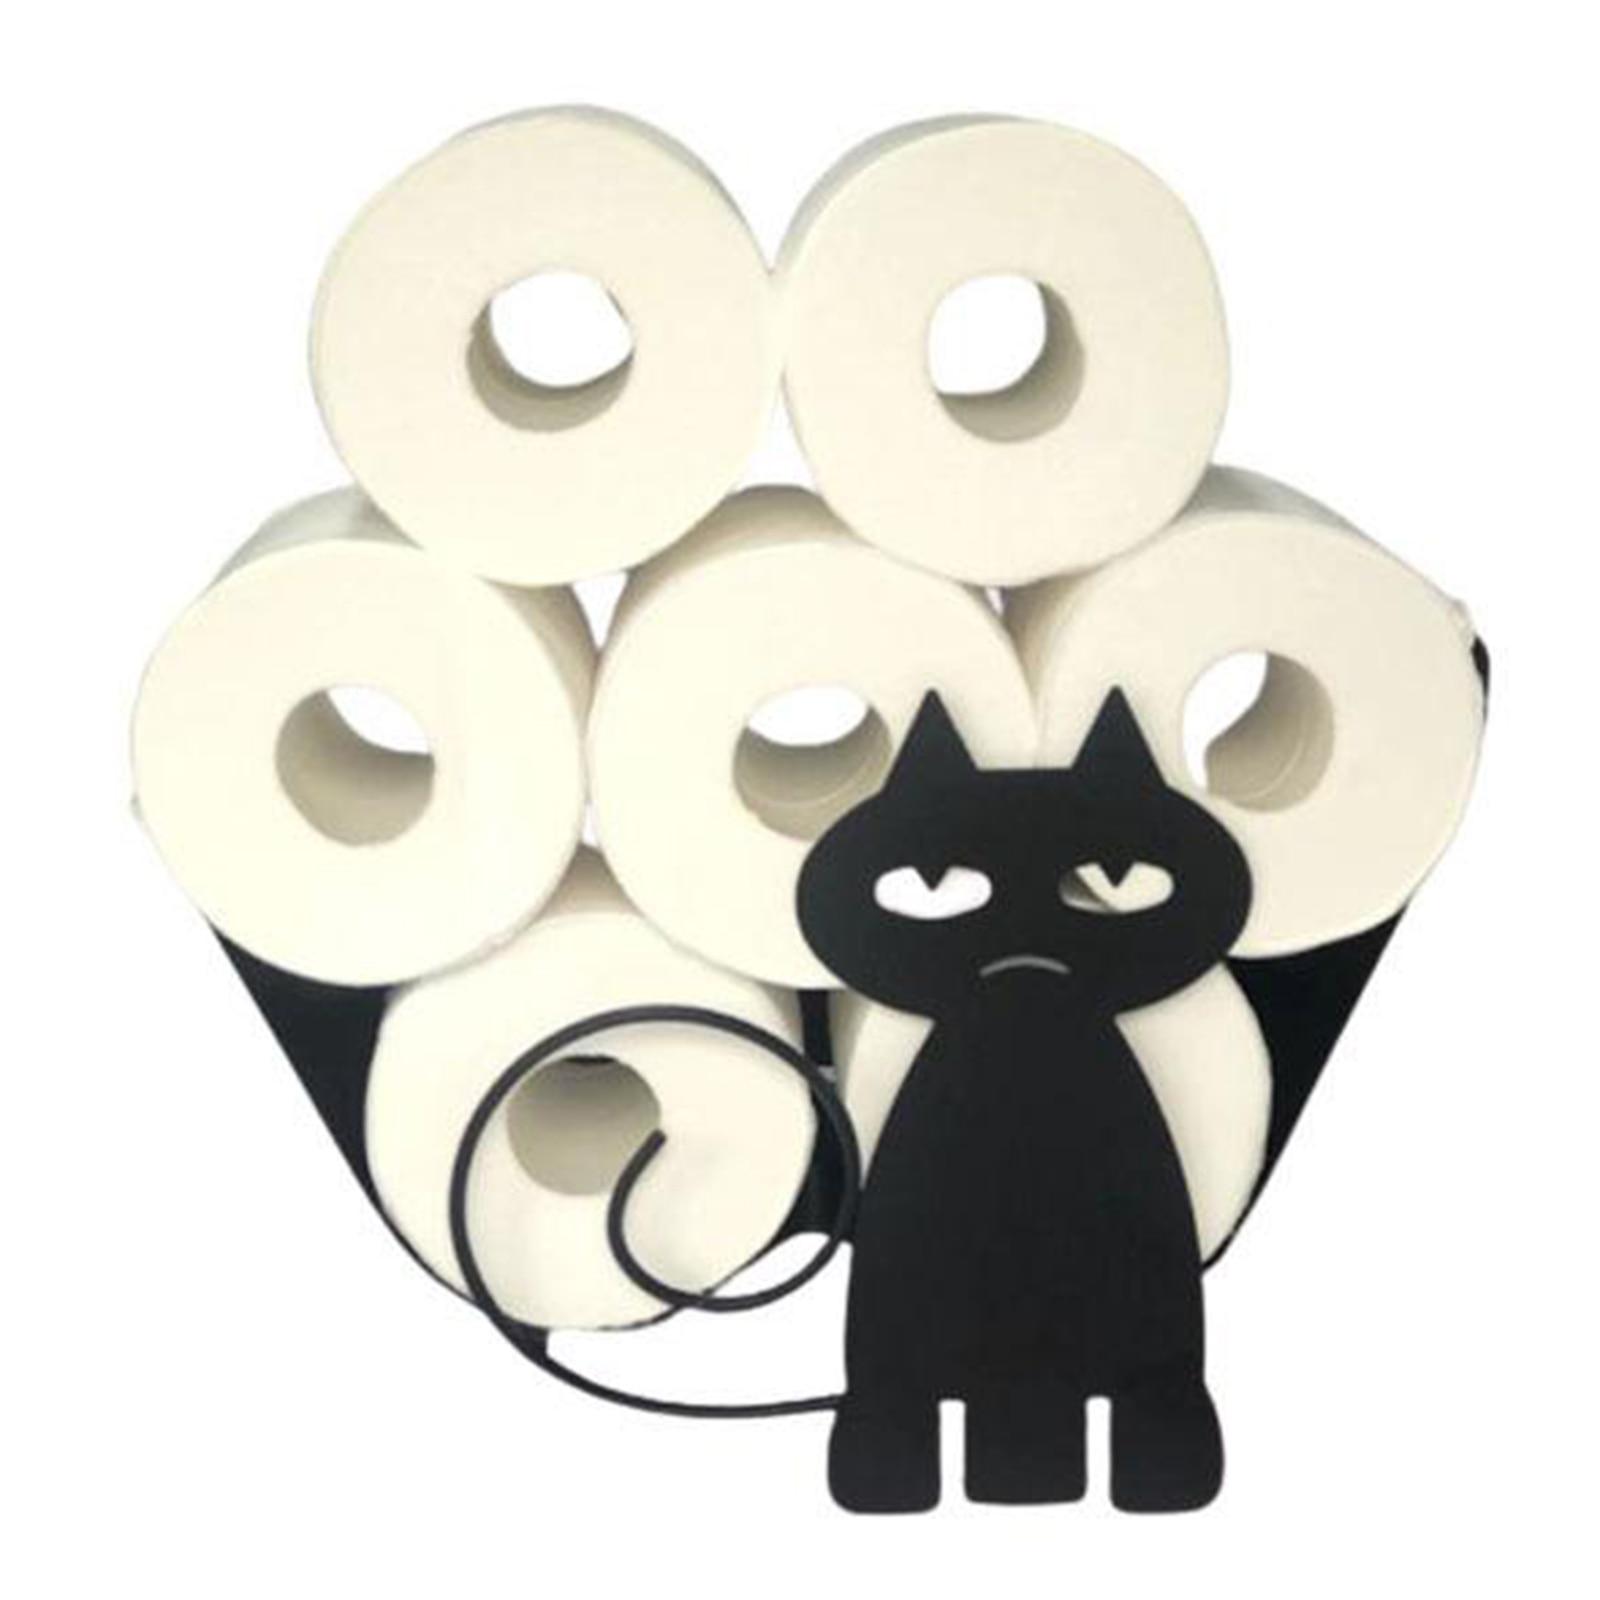 AliExpress - Toilet Roll Paper Holder Towel Iron Cat Storage Rack Novelty Toilet Tissue Holders Bathroom Paper Storage Powder Organization